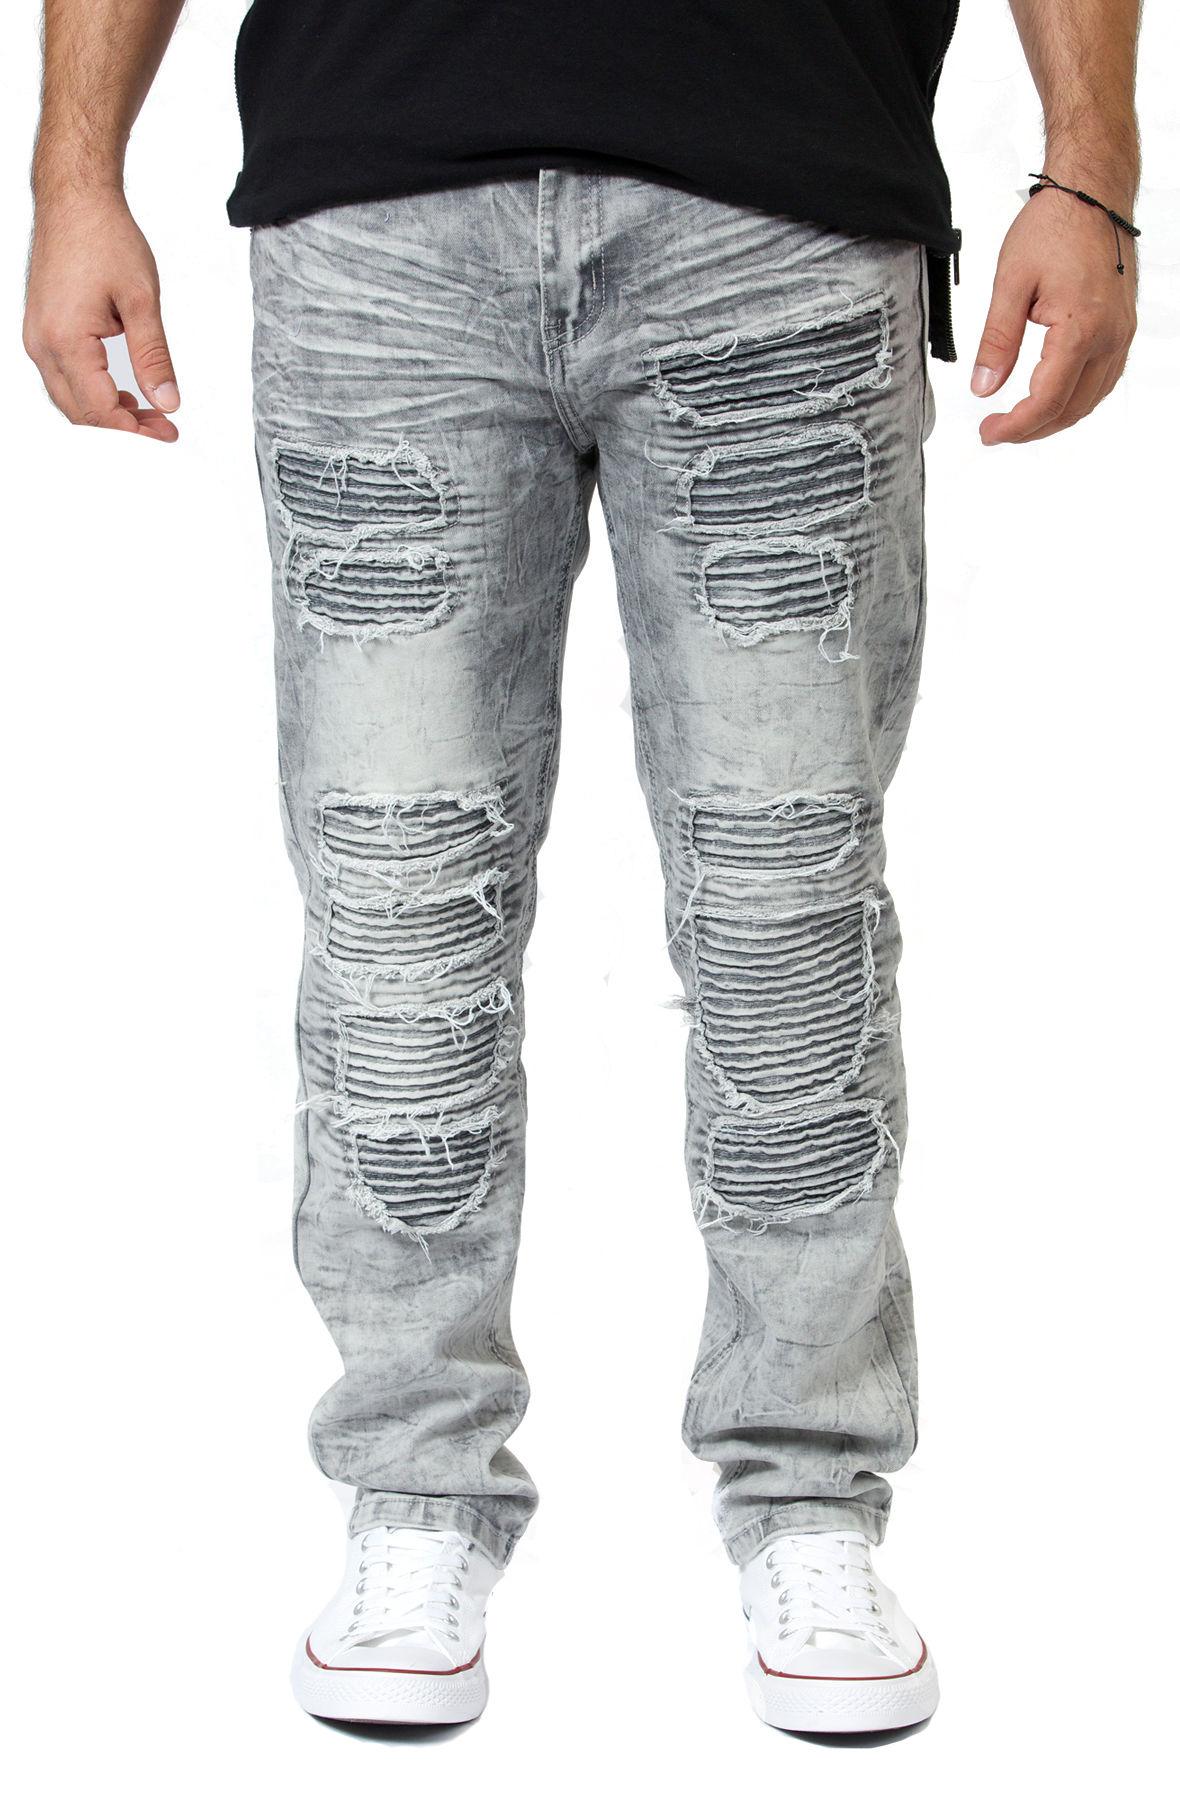 Image of Slim Fit Biker Jeans in Black Ice